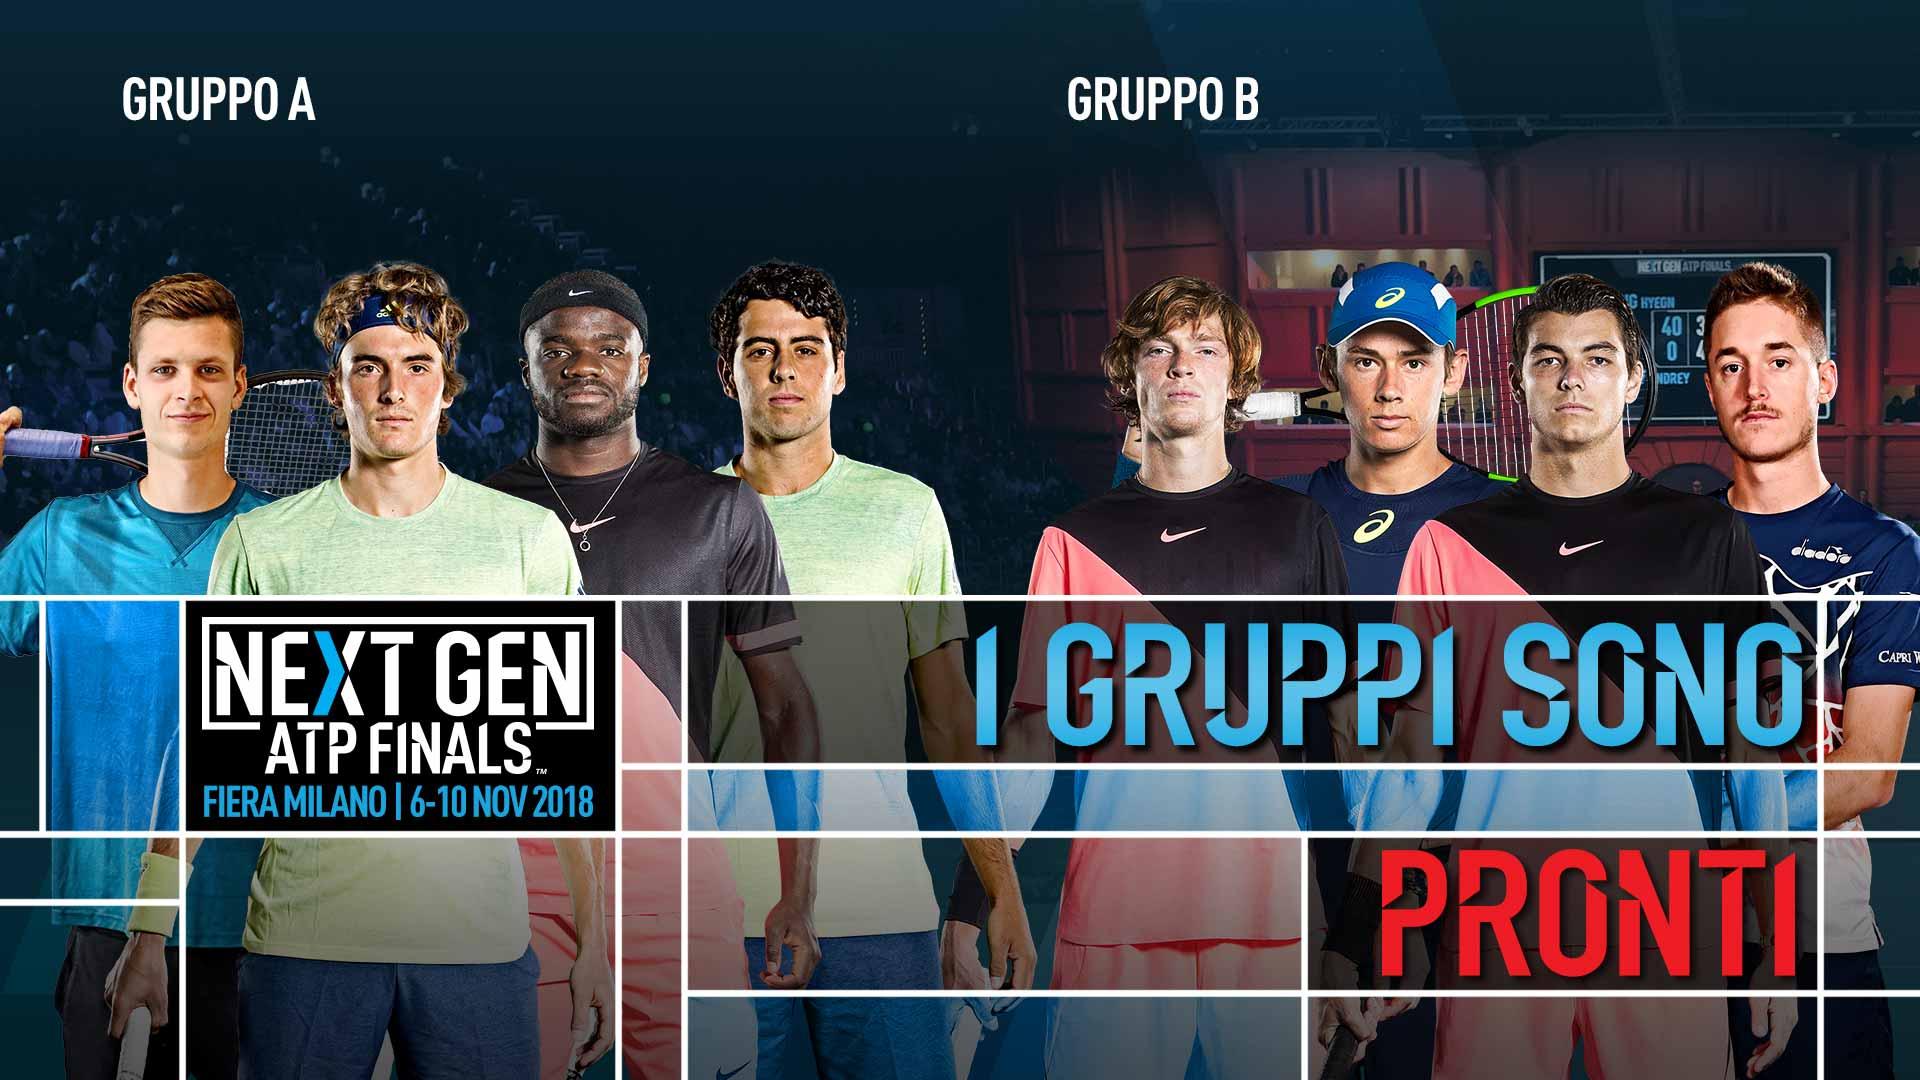 Next Gen Atp Finals Milano